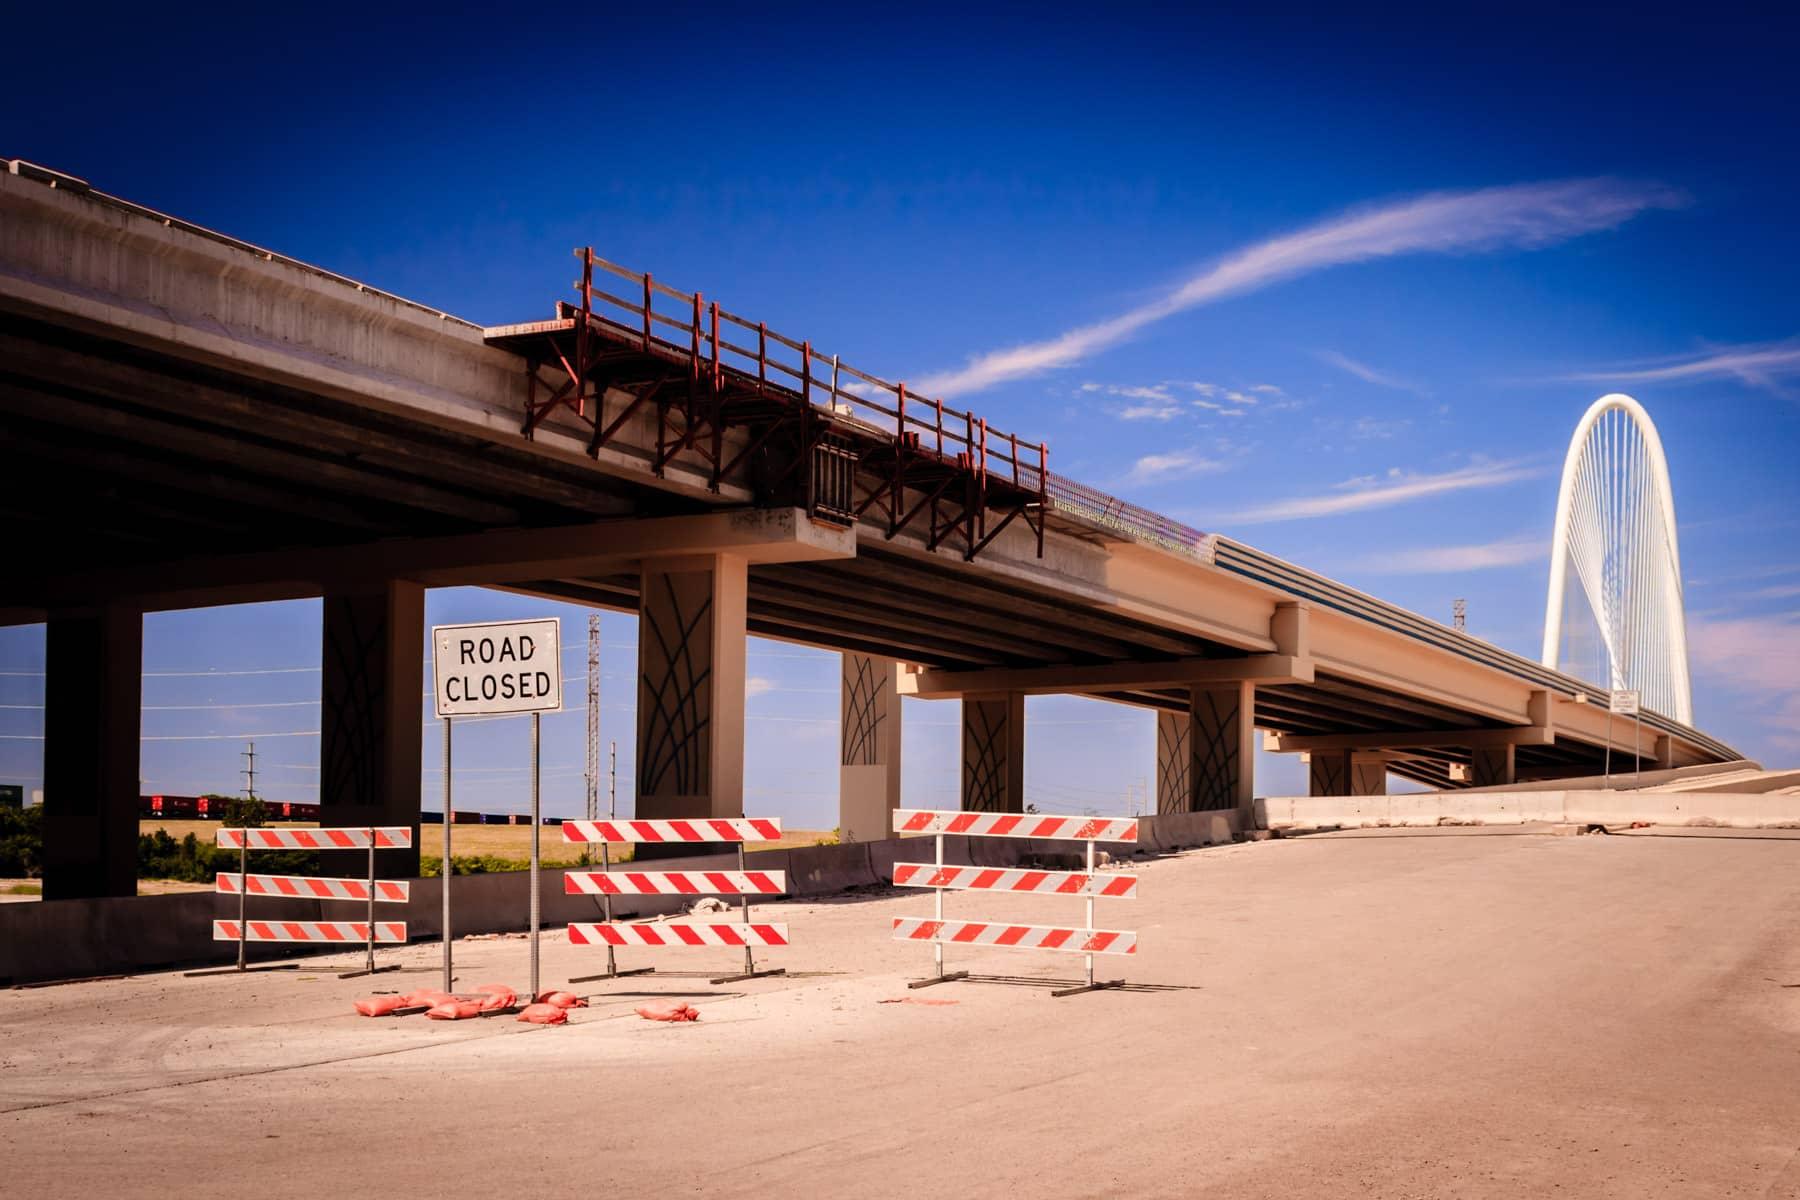 Construction on the approaches to the Santiago Calatrava-designed Margaret Hunt Hill Bridge in Dallas.